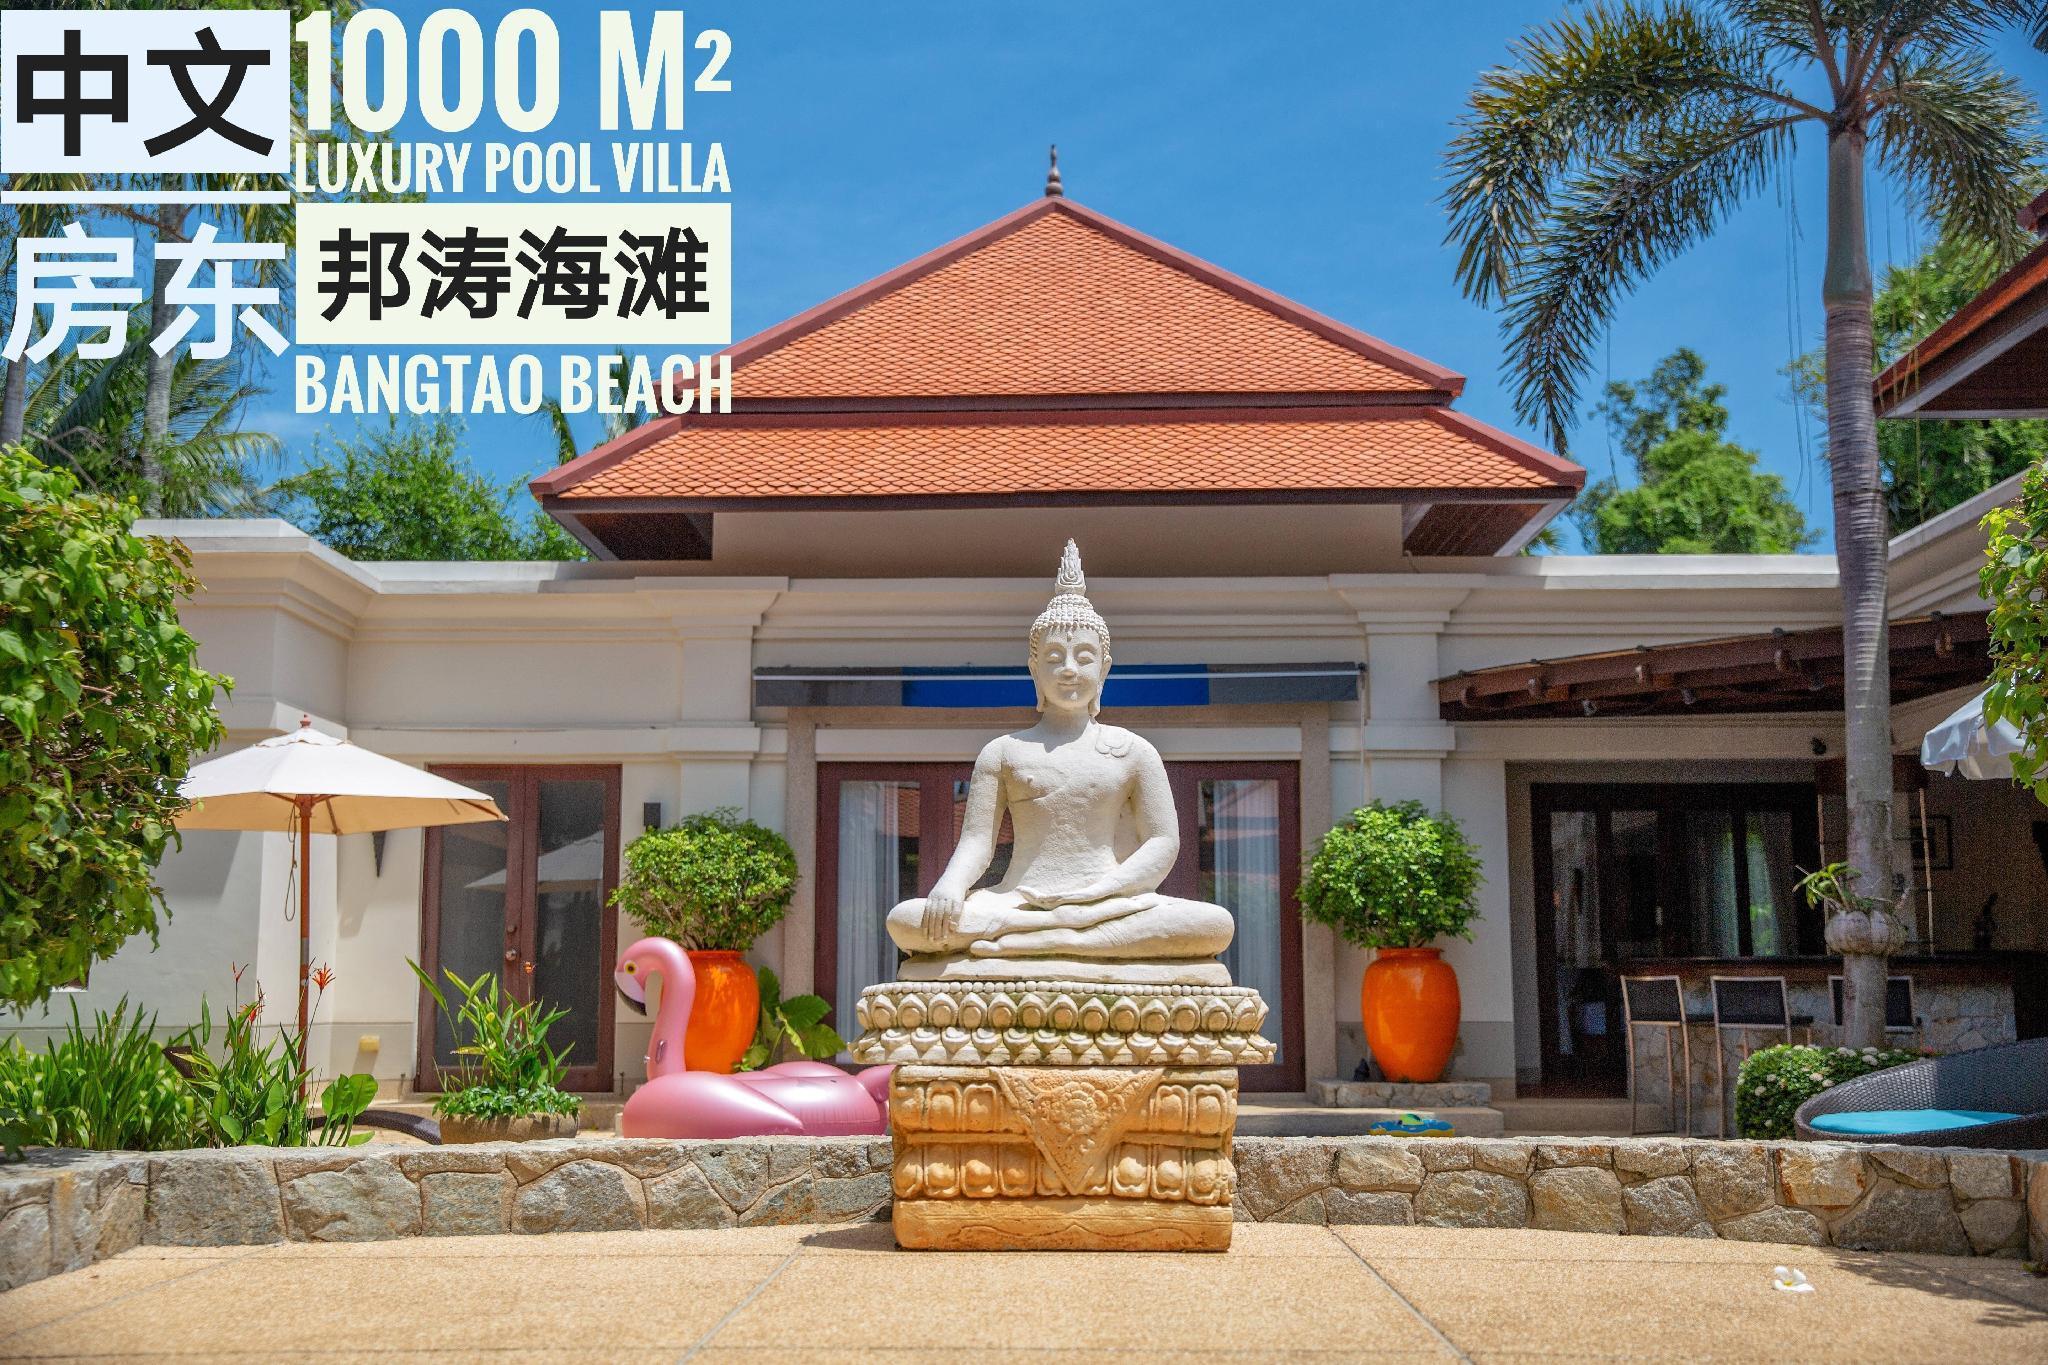 Luxury 4bedsrooms pool villa,cener of Laguna วิลลา 4 ห้องนอน 4 ห้องน้ำส่วนตัว ขนาด 1000 ตร.ม. – บางเทา